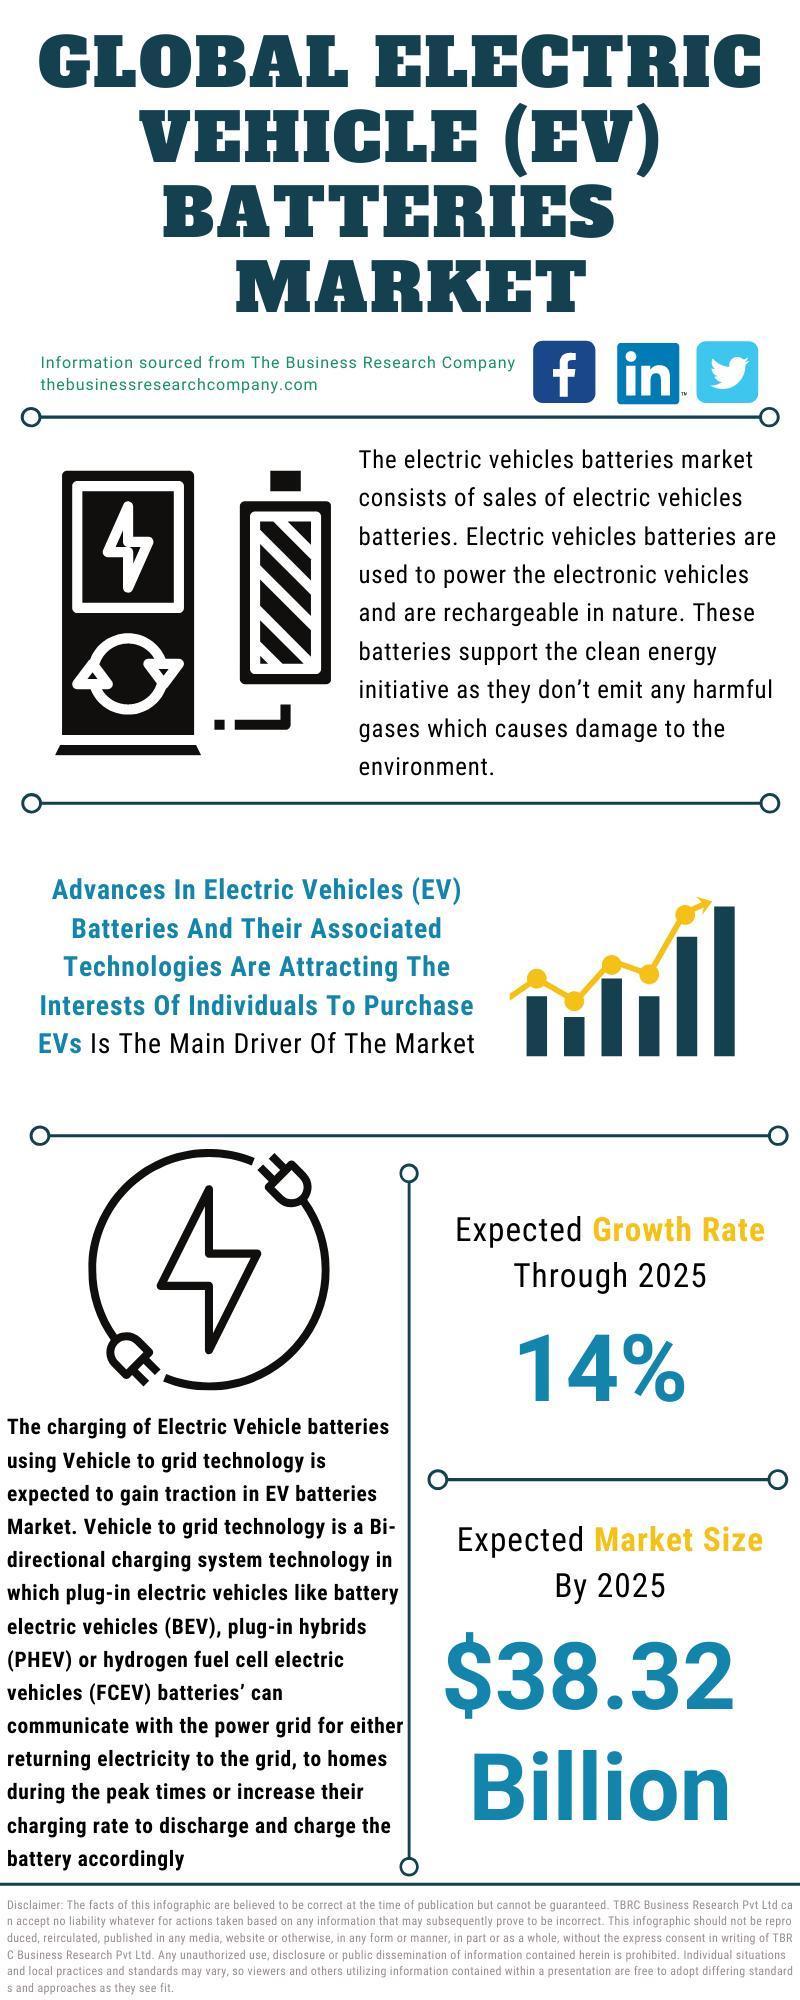 Electric Vehicle (EV) Batteries Market